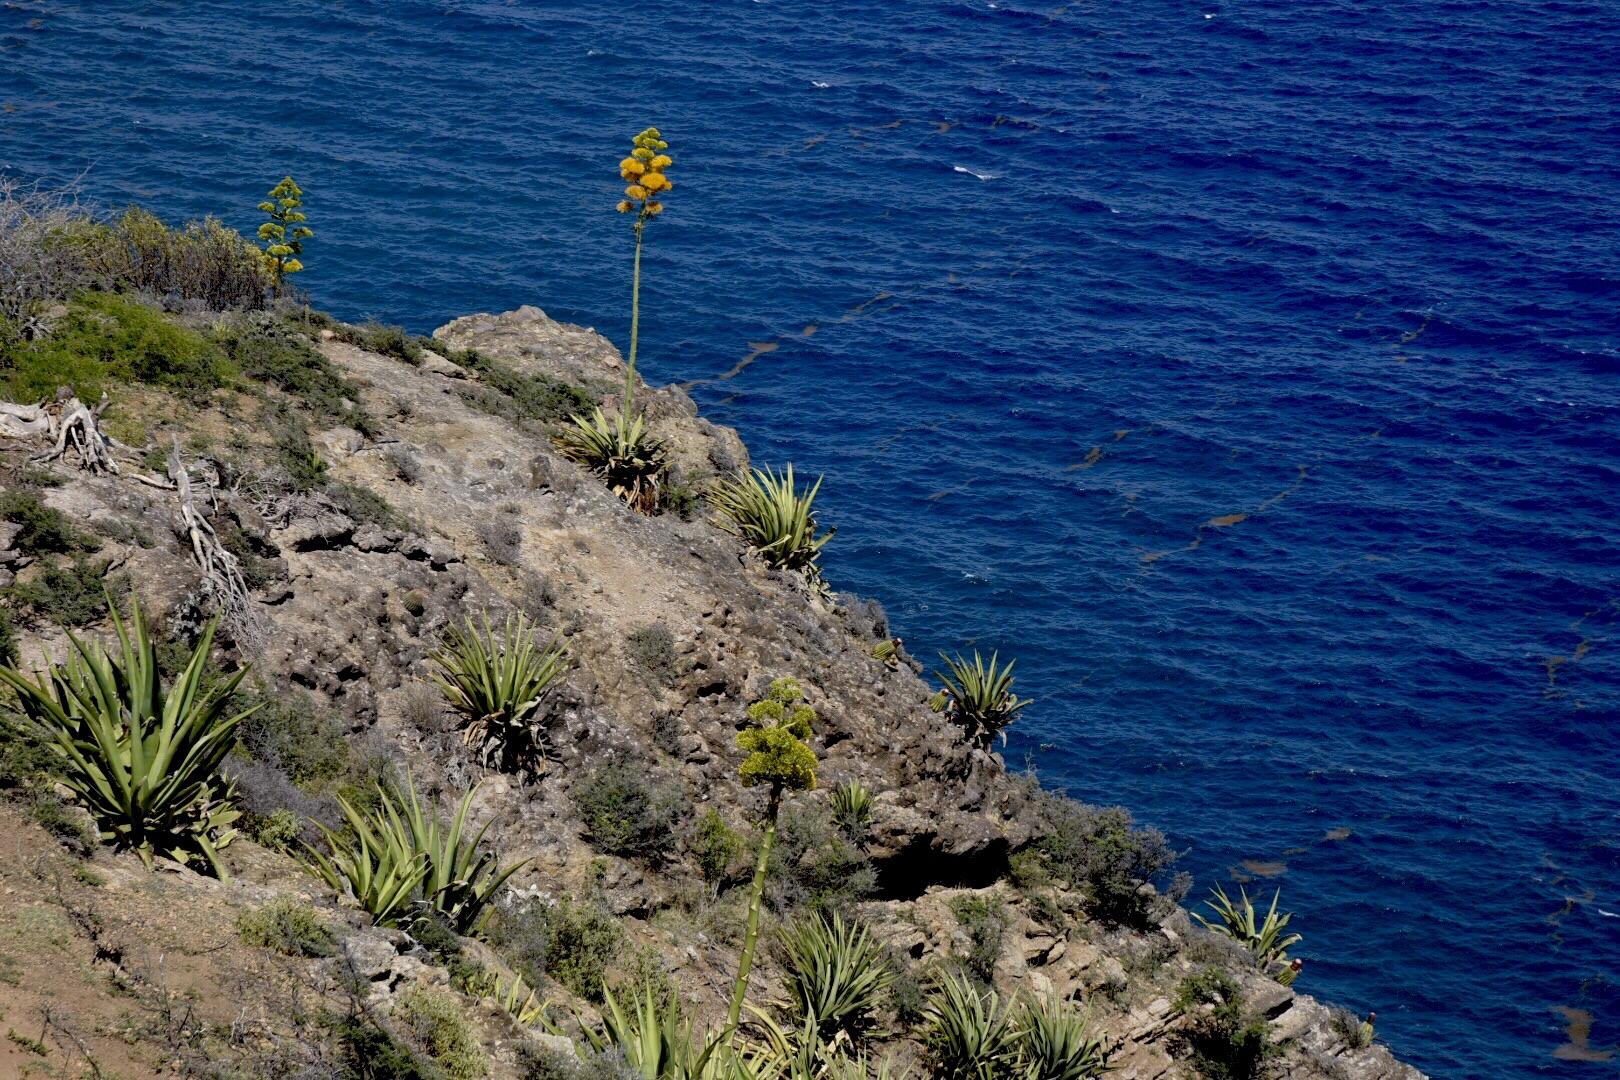 The dramatic century plant on the coast of Antigua